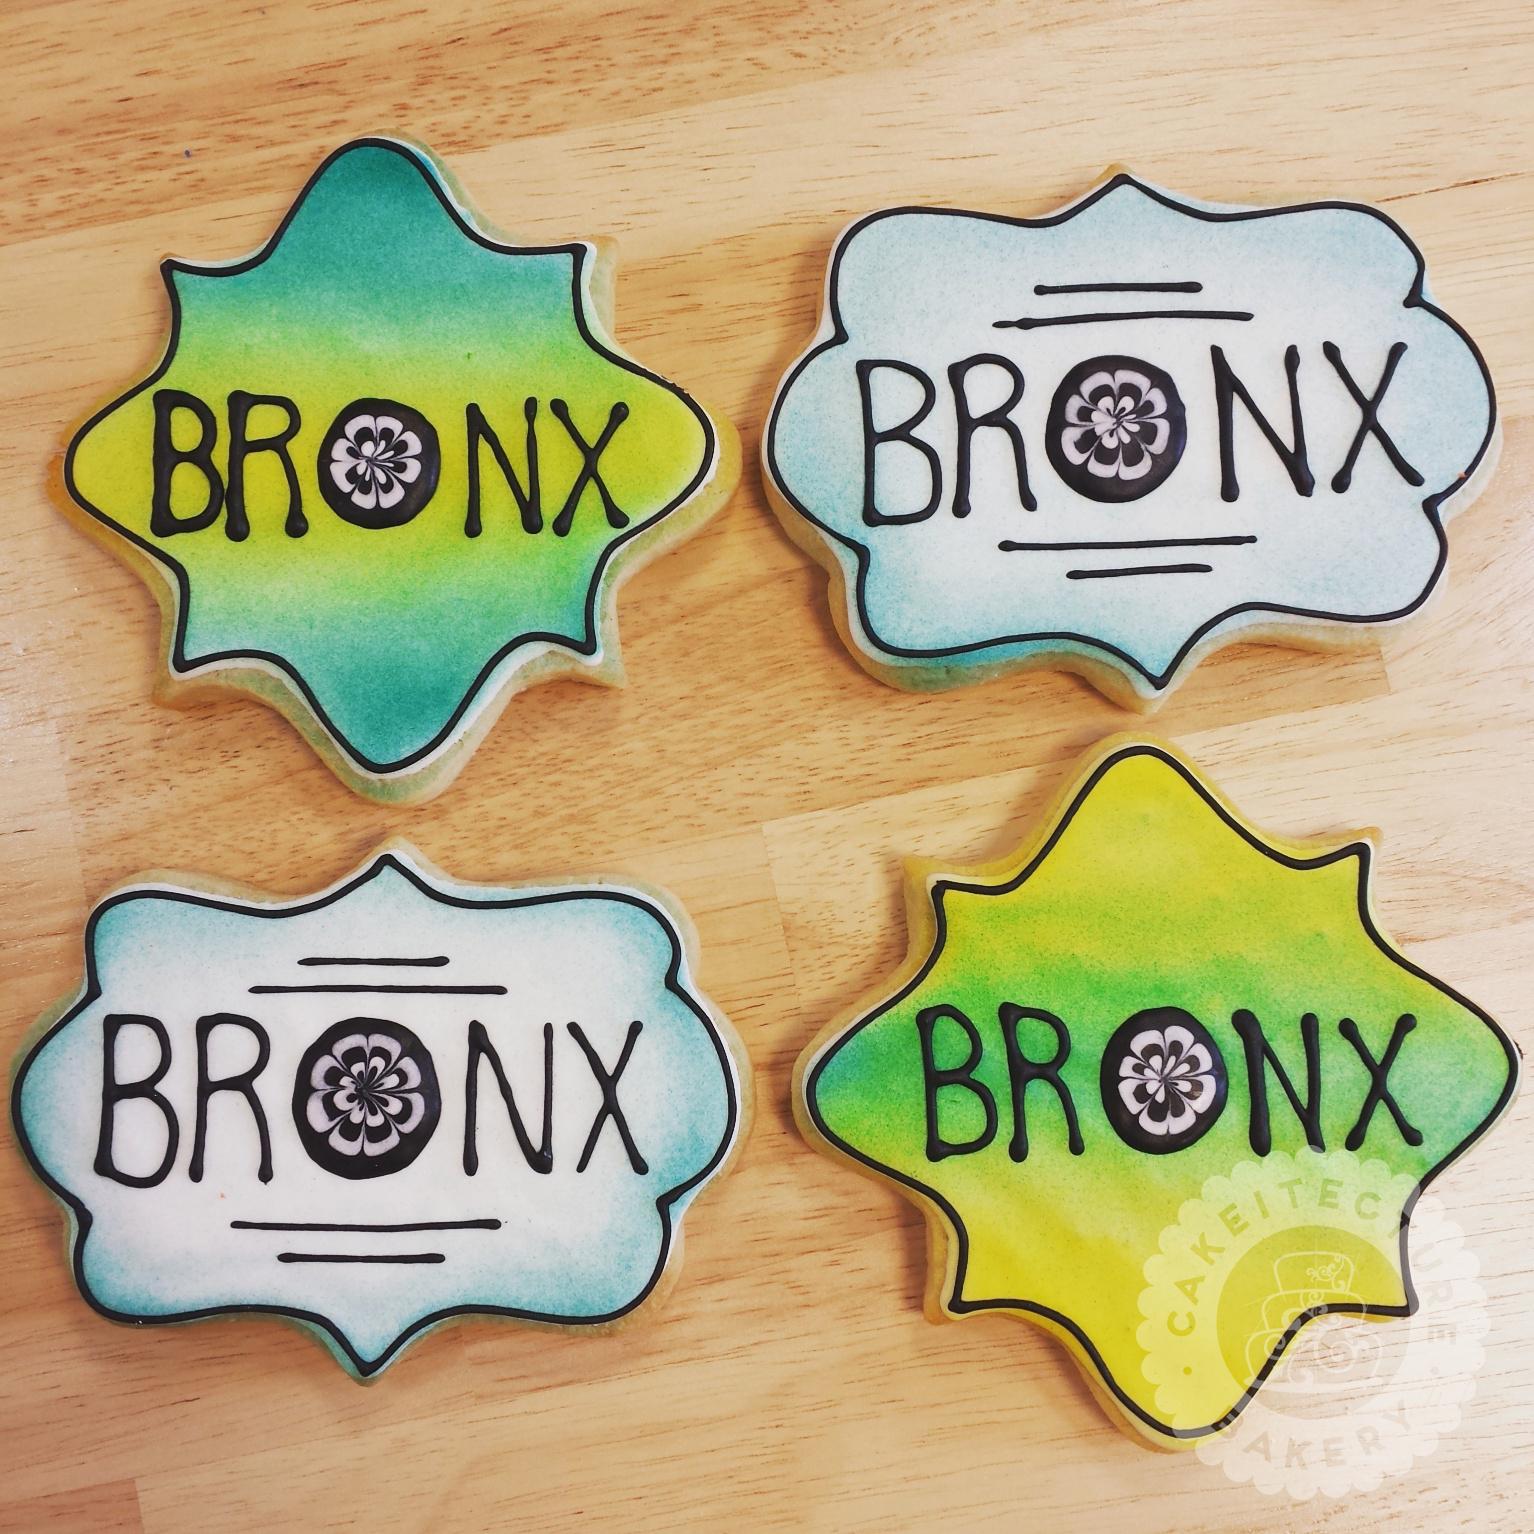 Cakeitecture Bakery bronx cookies.jpg